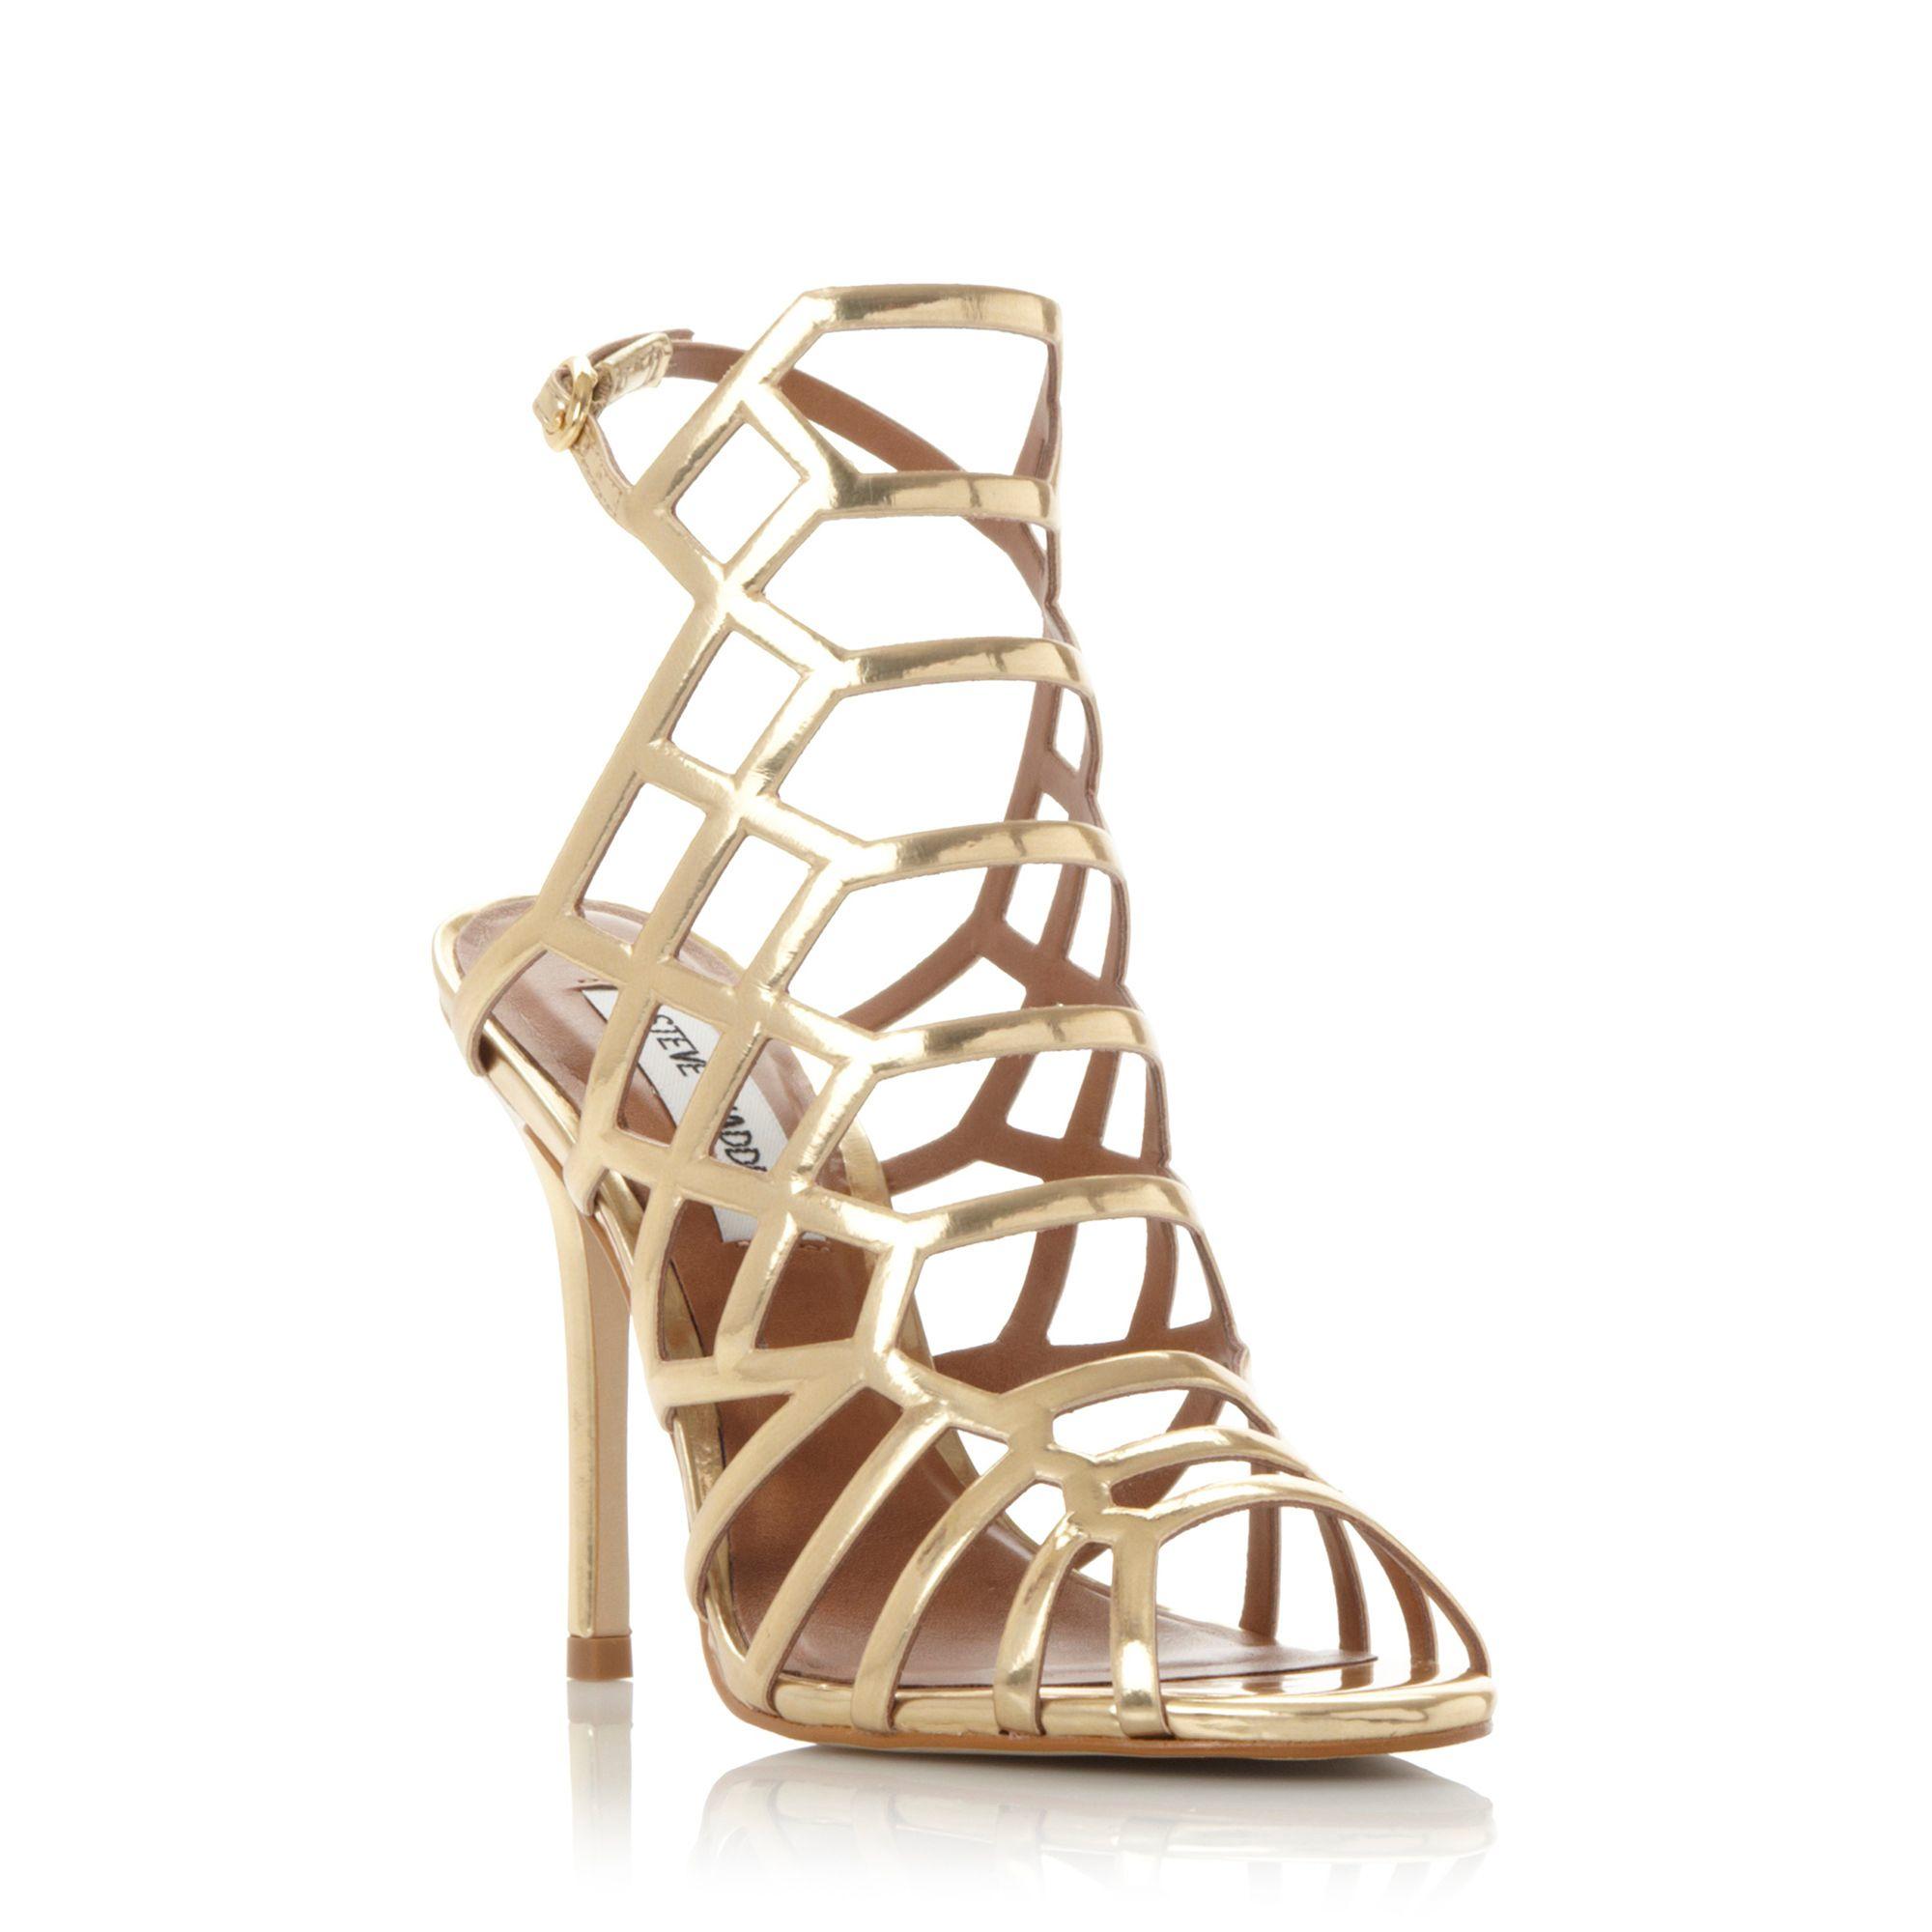 Steve madden Slither Caged High Heel Sandals in Metallic  Lyst